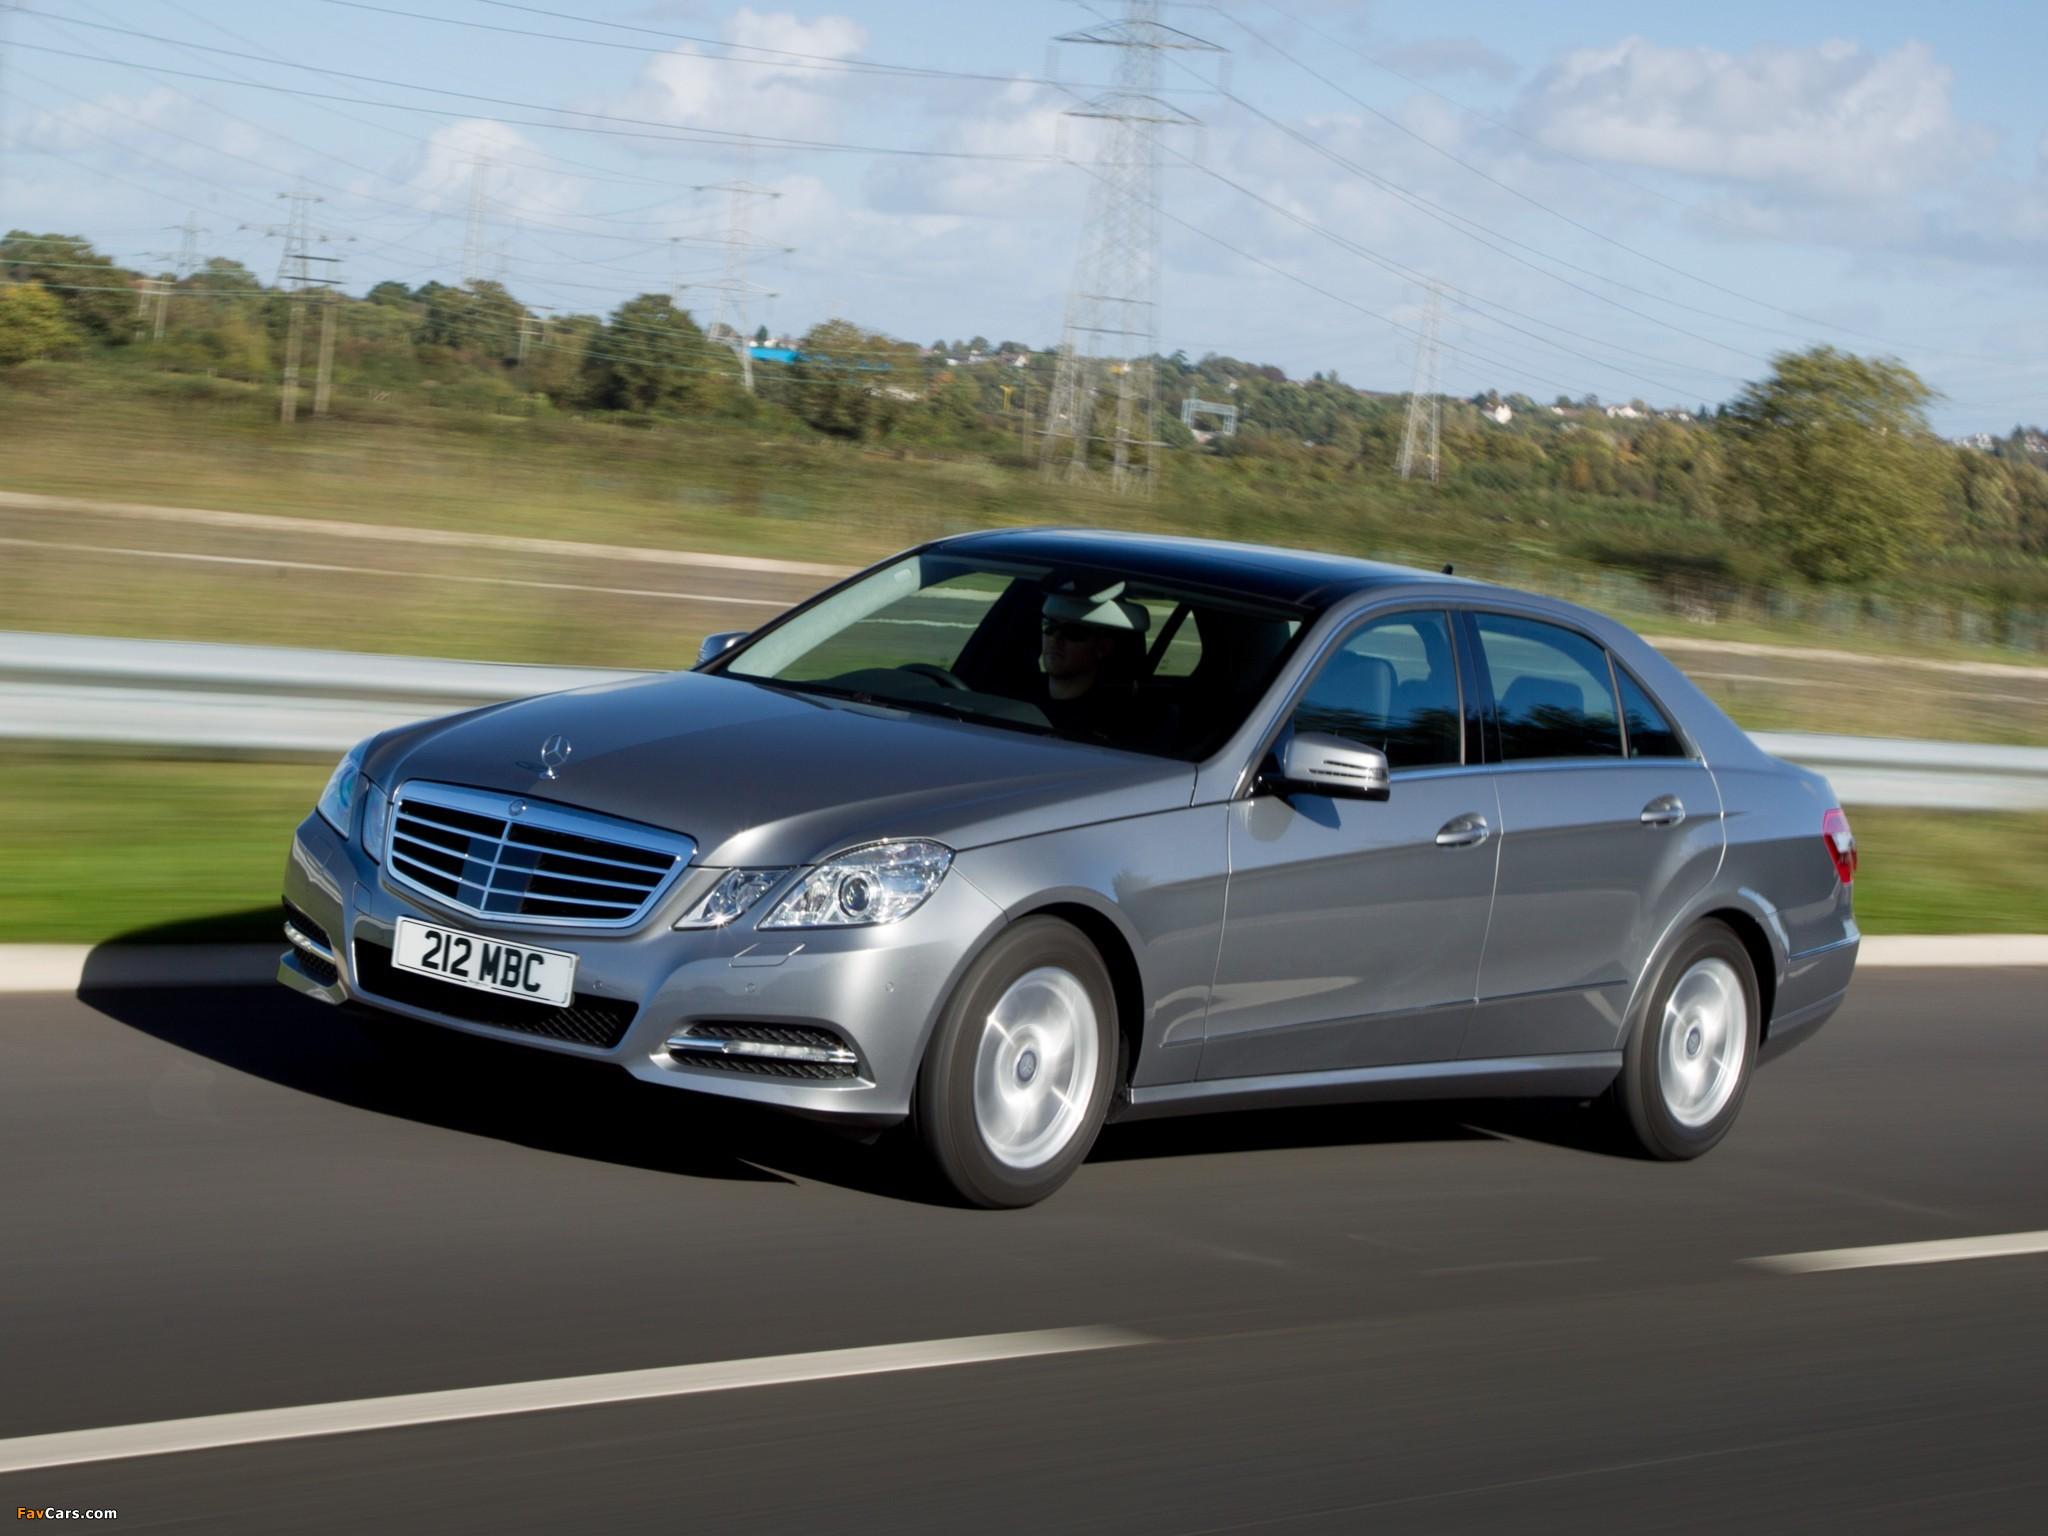 Mercedes benz e 300 bluetec hybrid uk spec w212 2010 12 for Mercedes benz hybrid uk